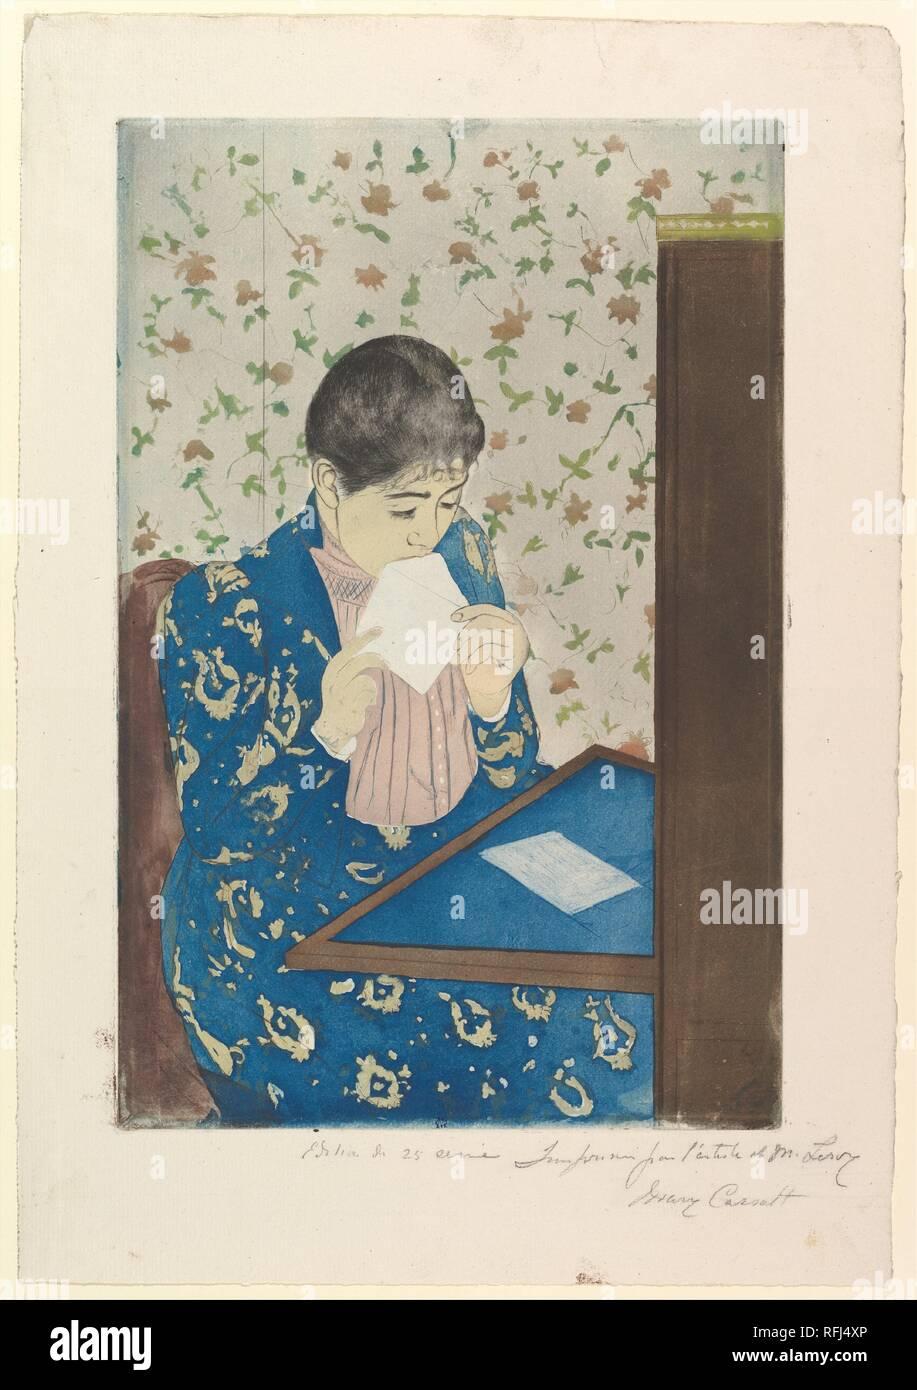 Der Brief. Artist: Mary Cassatt (Amerikanische, Pittsburgh, Pennsylvania 1844-1926 Le Mesnil-Théribus herum, Oise). Abmessungen: Platte: 13 5/8 x 8 15/16 in. (34,6 x 22,7 cm) Blatt: 17 x 11 cm. (43,2 x 29,8 cm). Datum: 1890-91. Museum: Metropolitan Museum of Art, New York, USA. Stockfoto